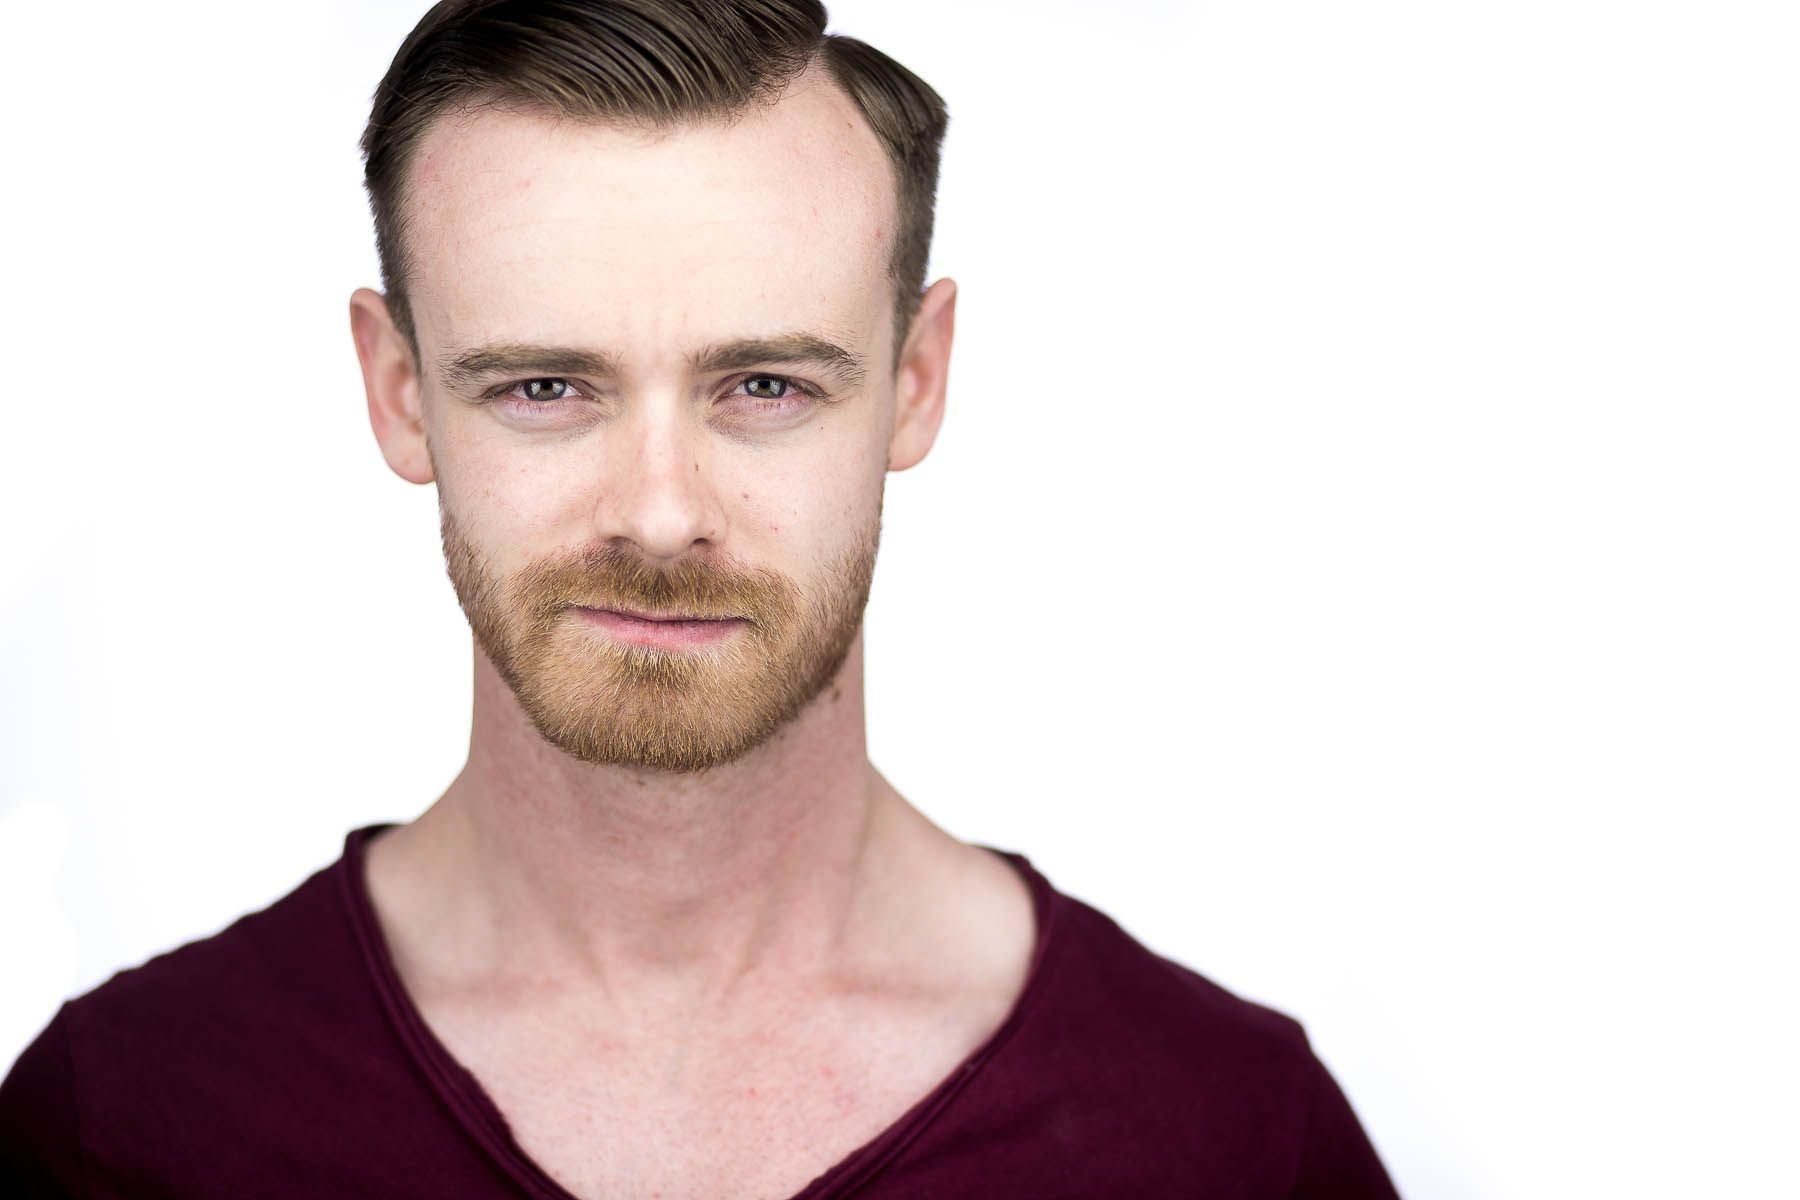 matt-actor-professional-headshot-session-21.jpg